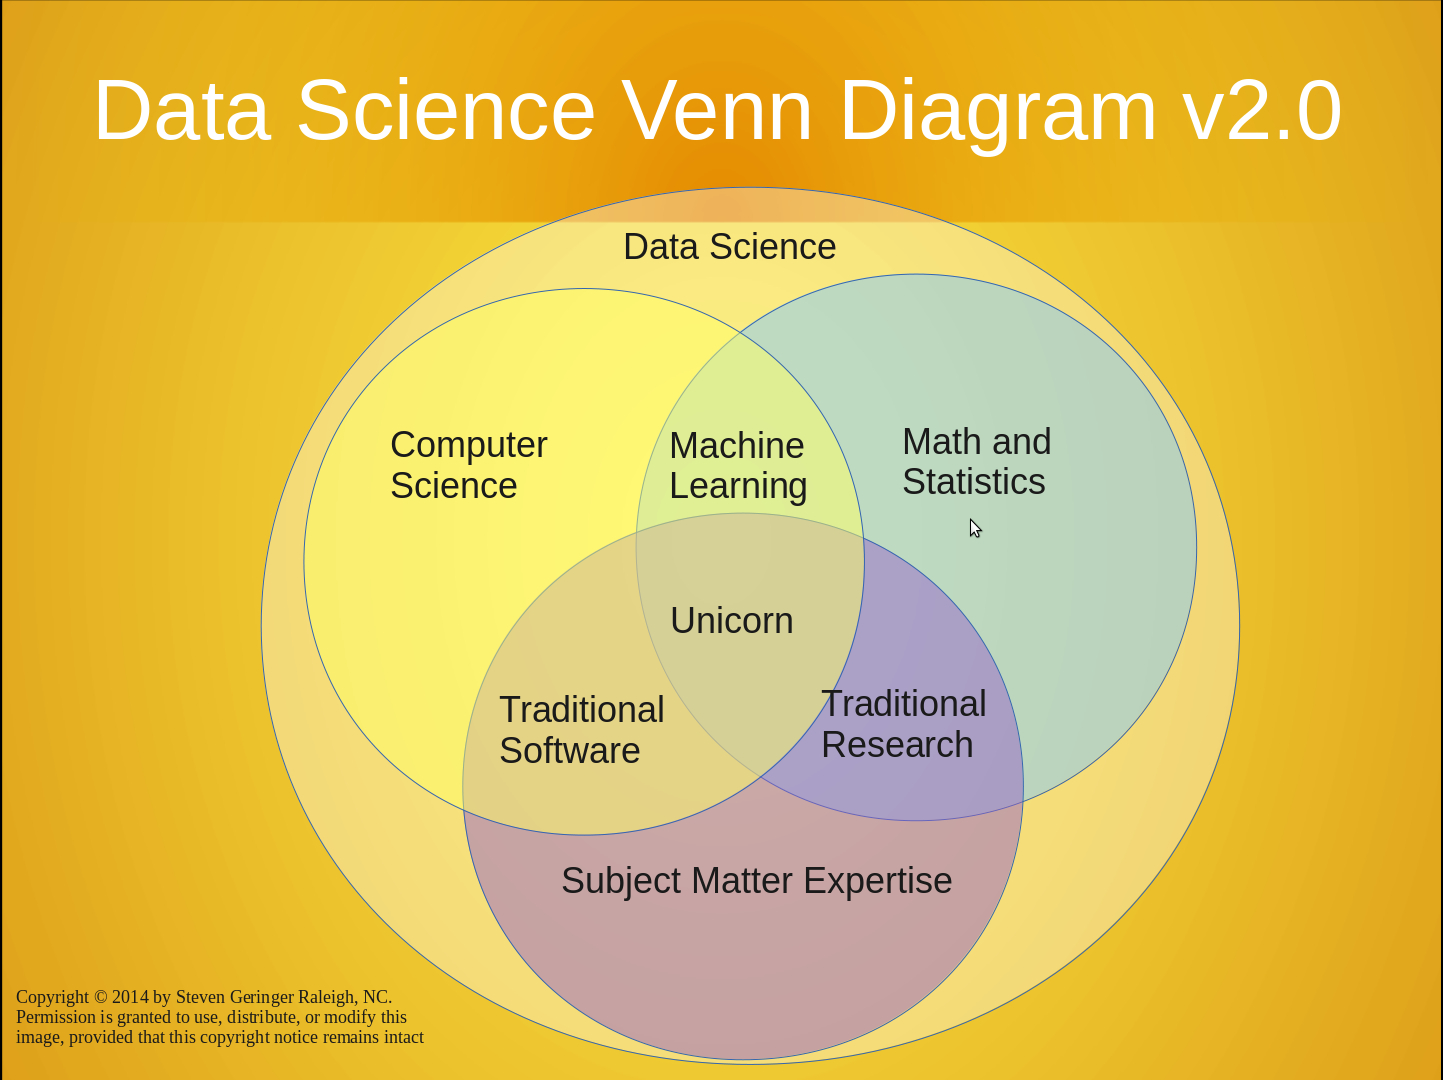 What Is A Venn Diagram Battle Of The Data Science Venn Diagrams